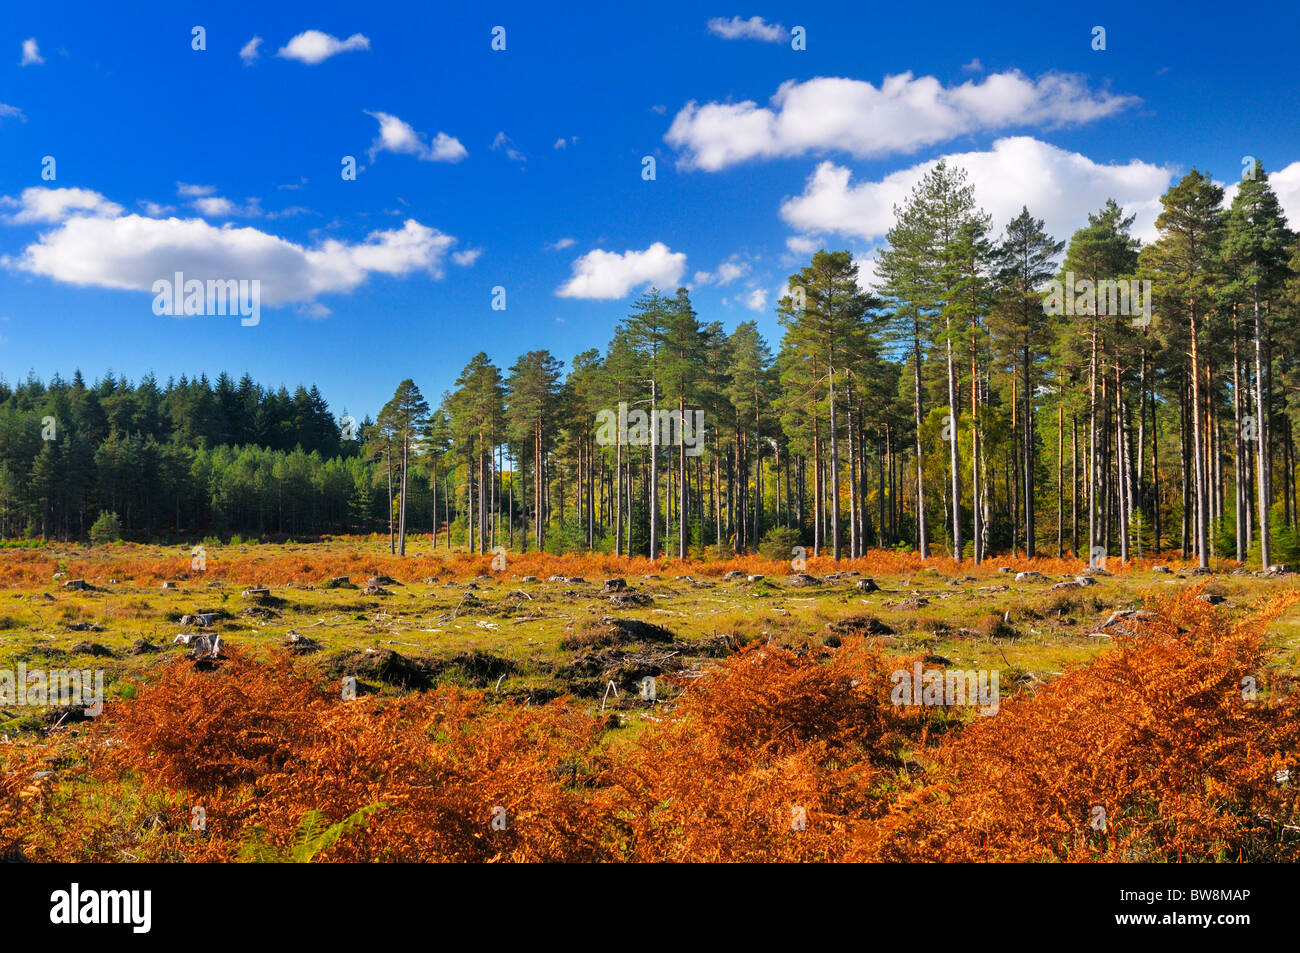 New Forest National Park, pine tree plantation clearing, Hampshire, England, UK Stock Photo